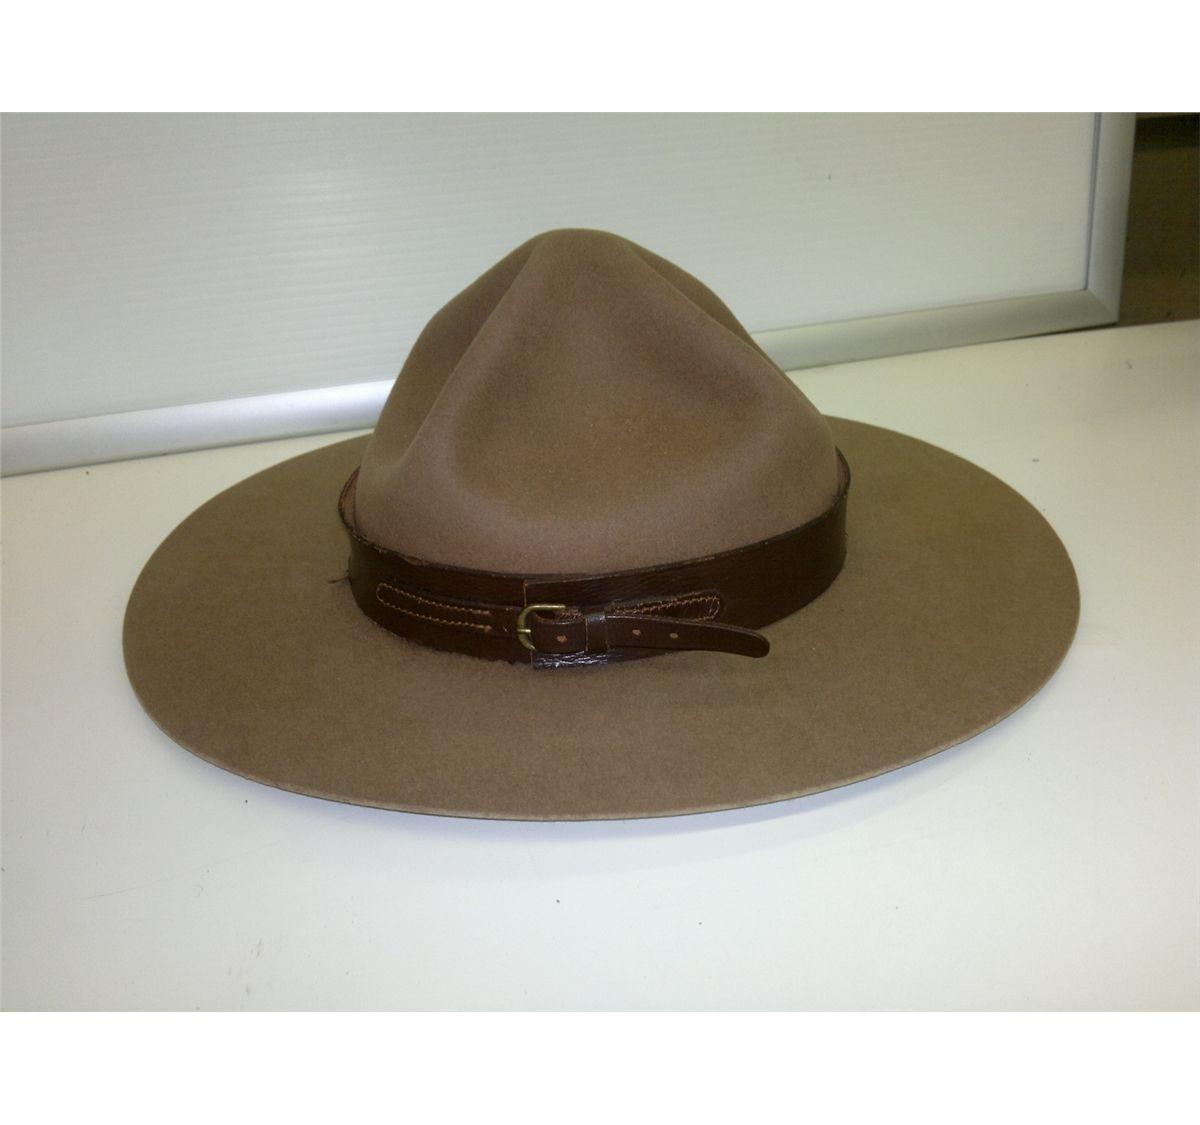 a6af78a7fa358 RCMP Mounty Hat Christy s London. Loading zoom